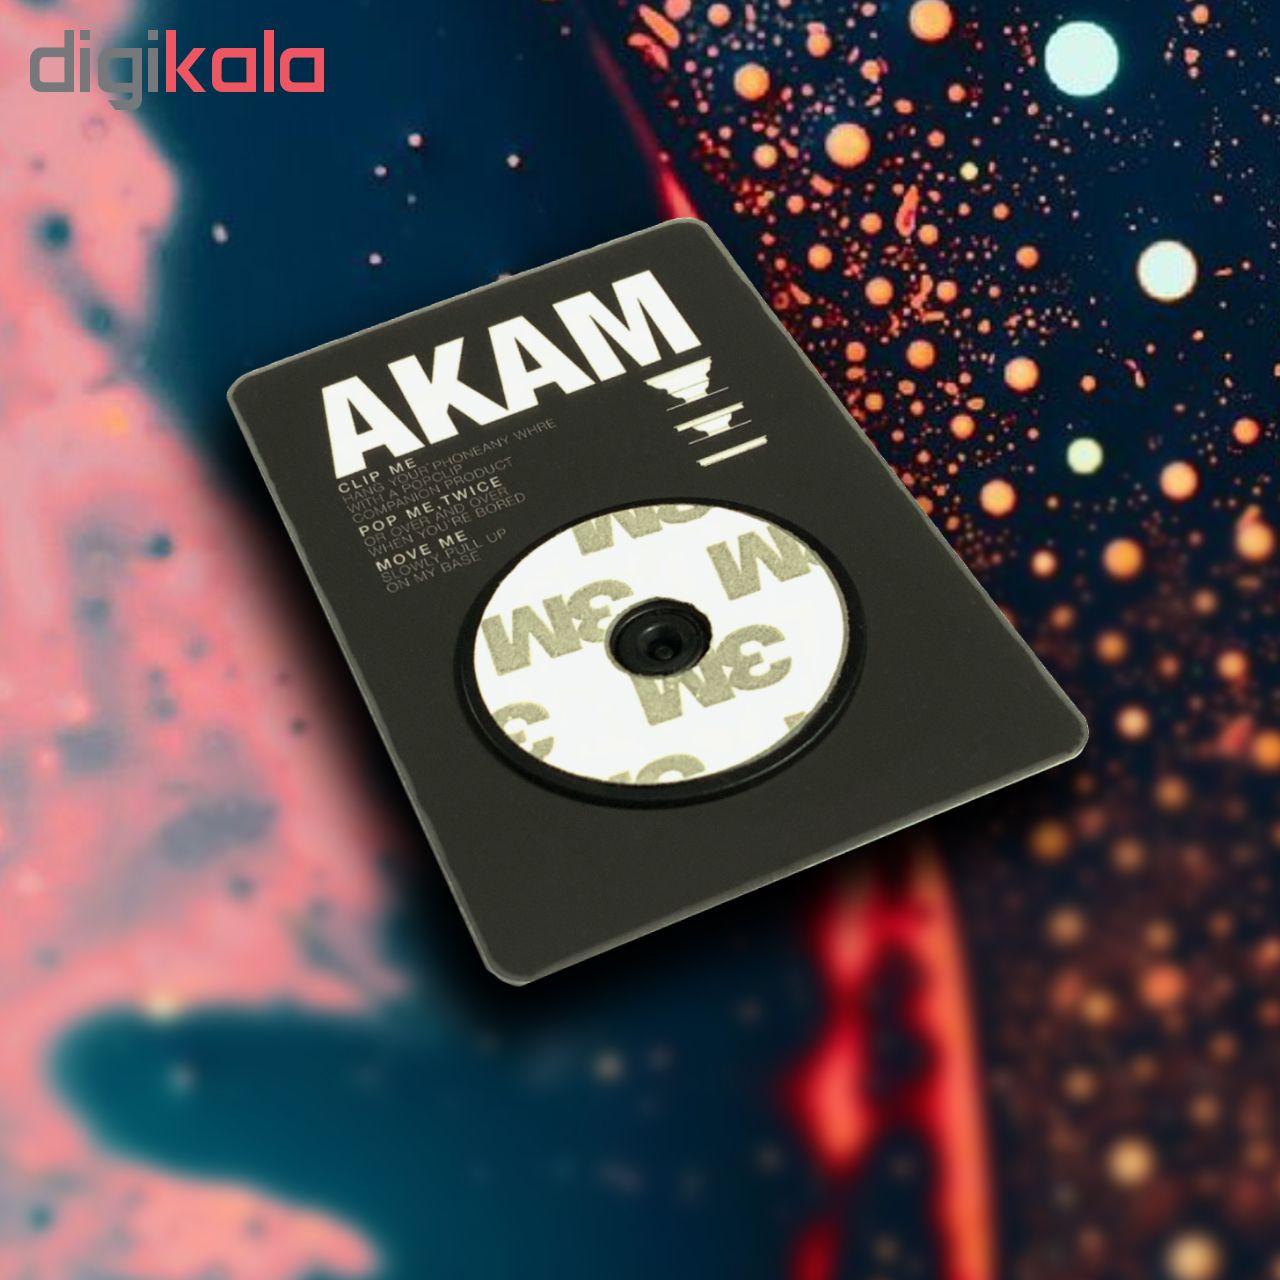 پایه نگهدارنده گوشی موبایل پاپ سوکت آکام مدل APS0168 main 1 2